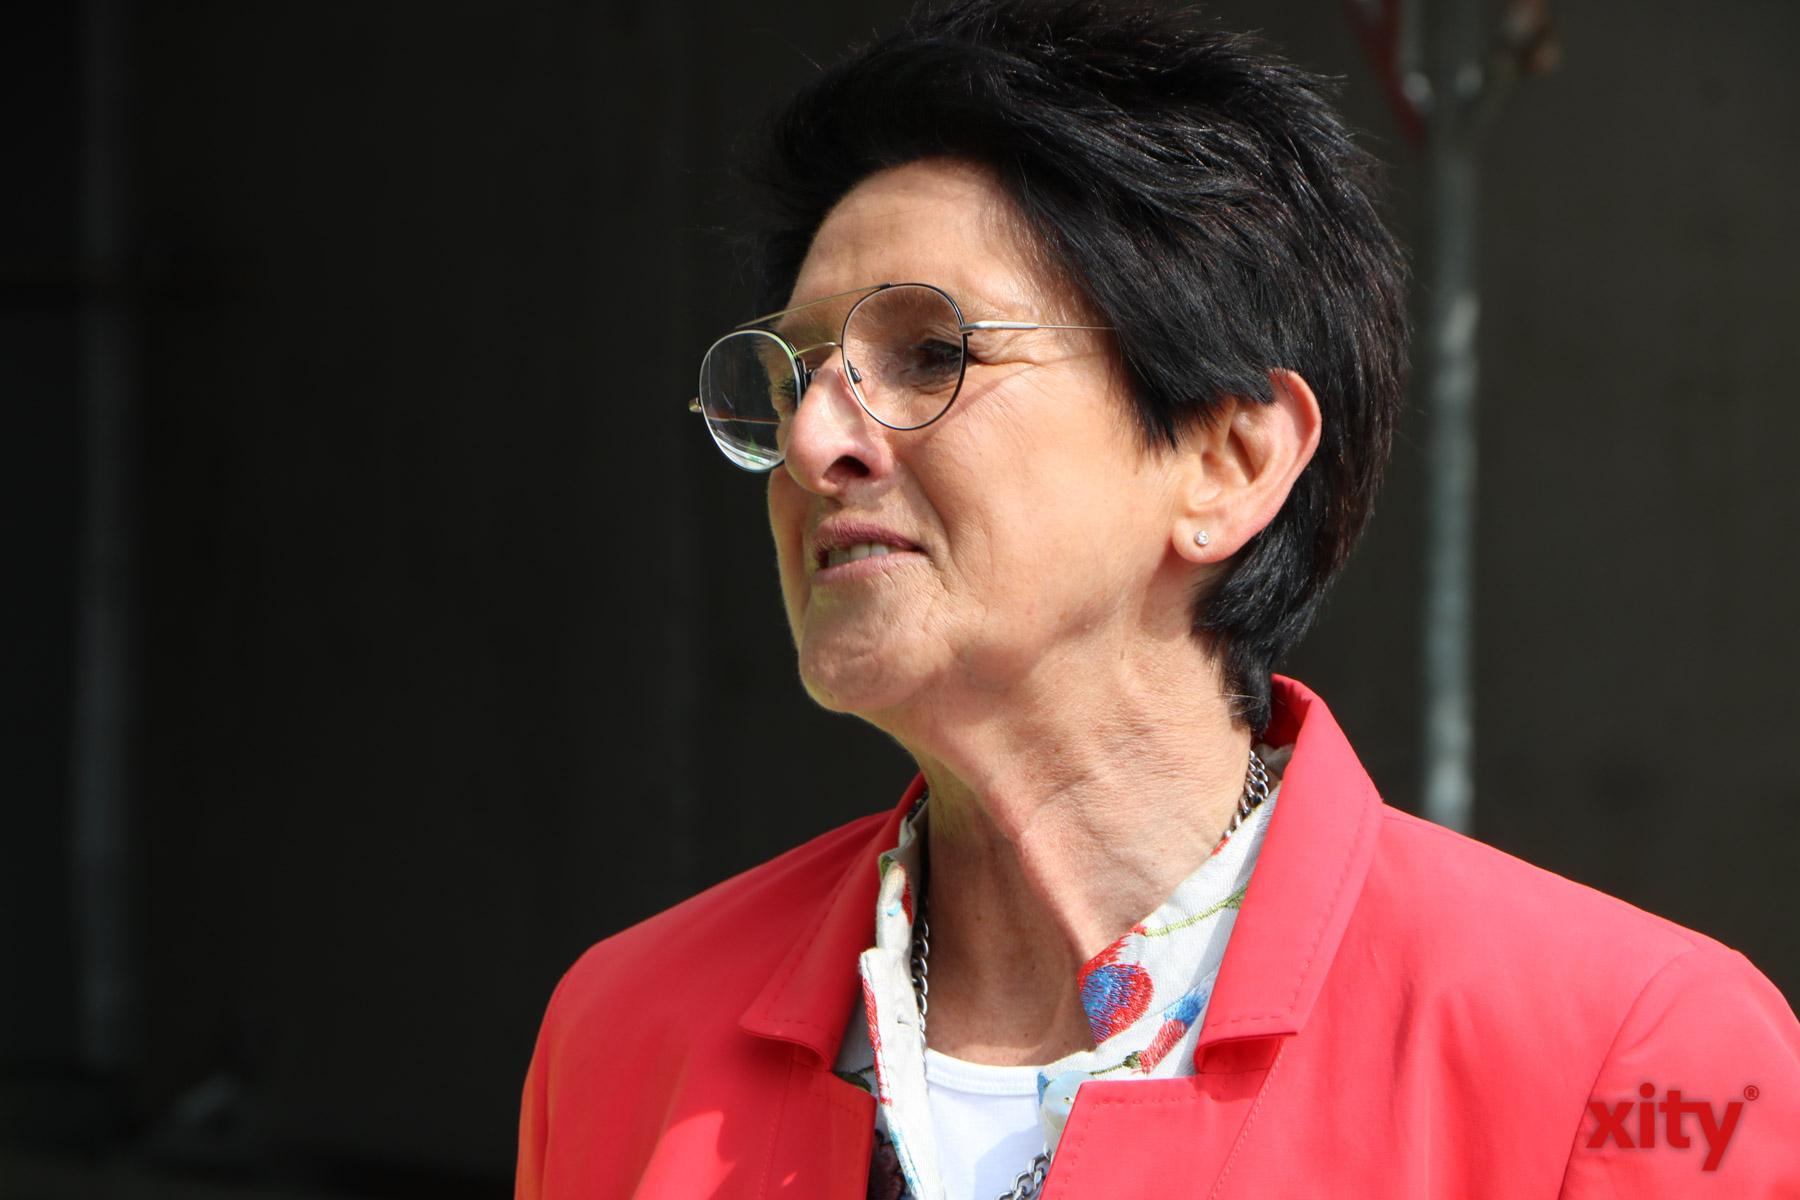 Schulleiterin Petra Steudel (Foto: xity)